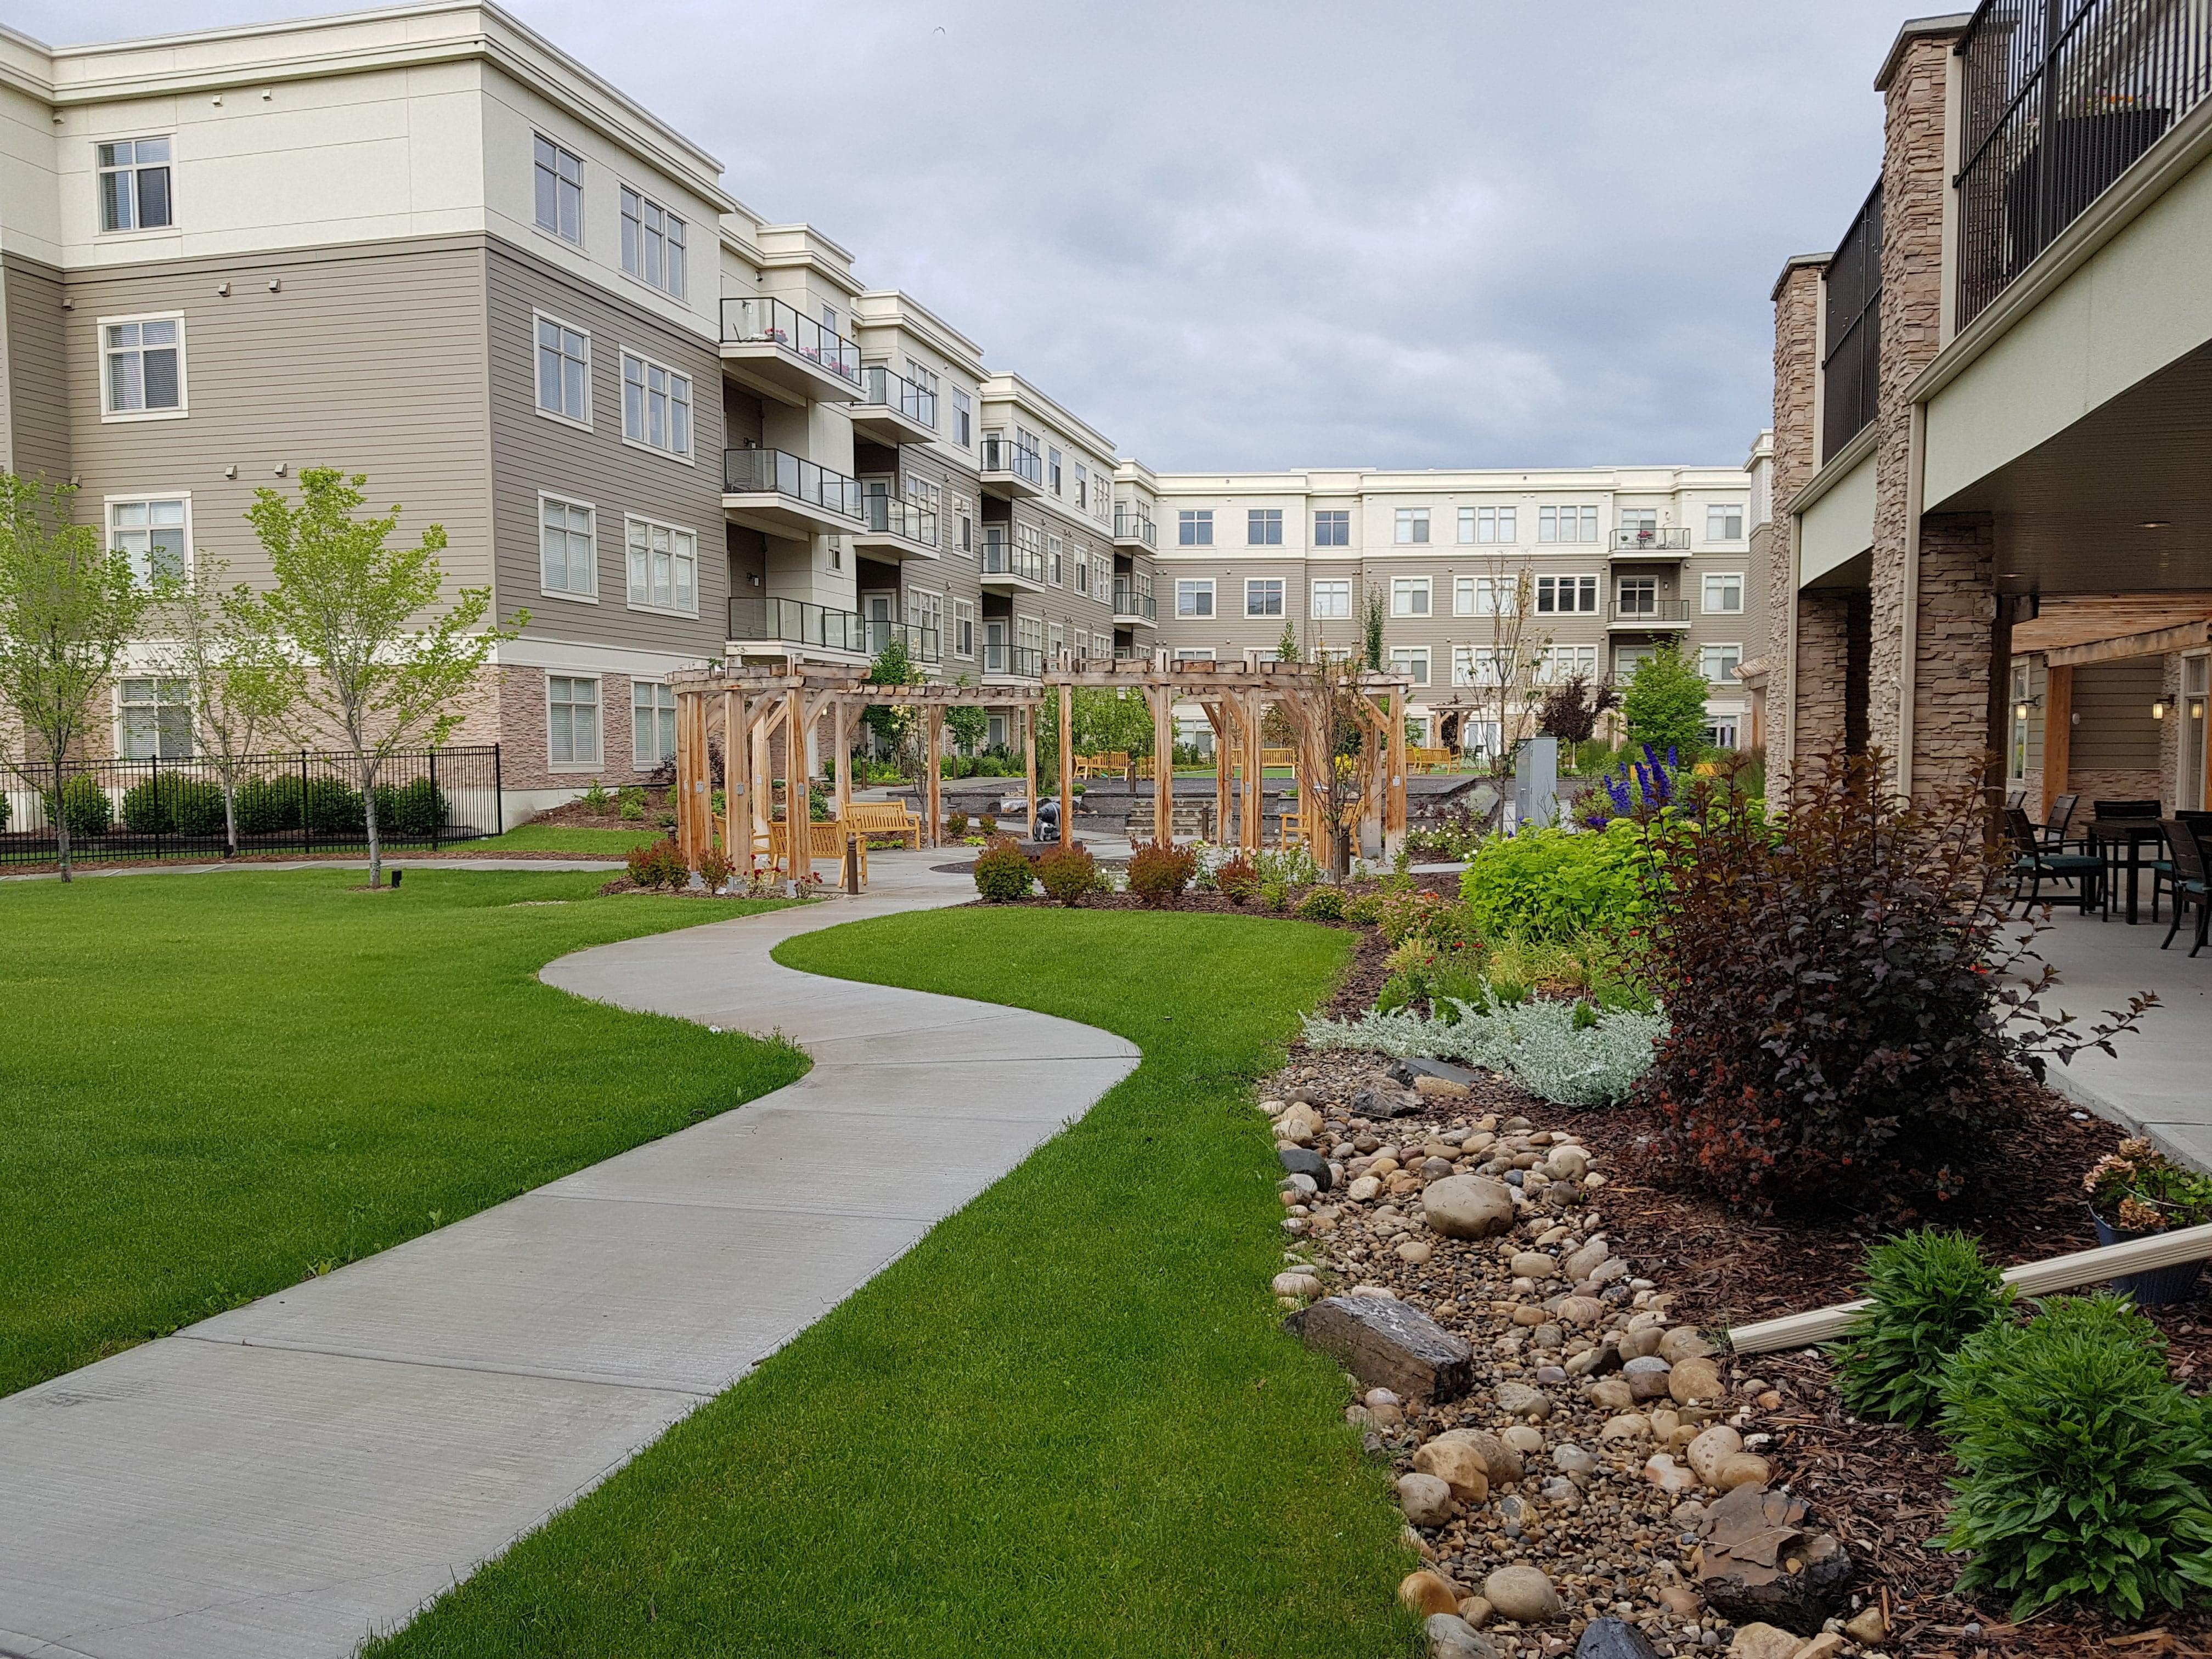 The courtyard at Fish Creek